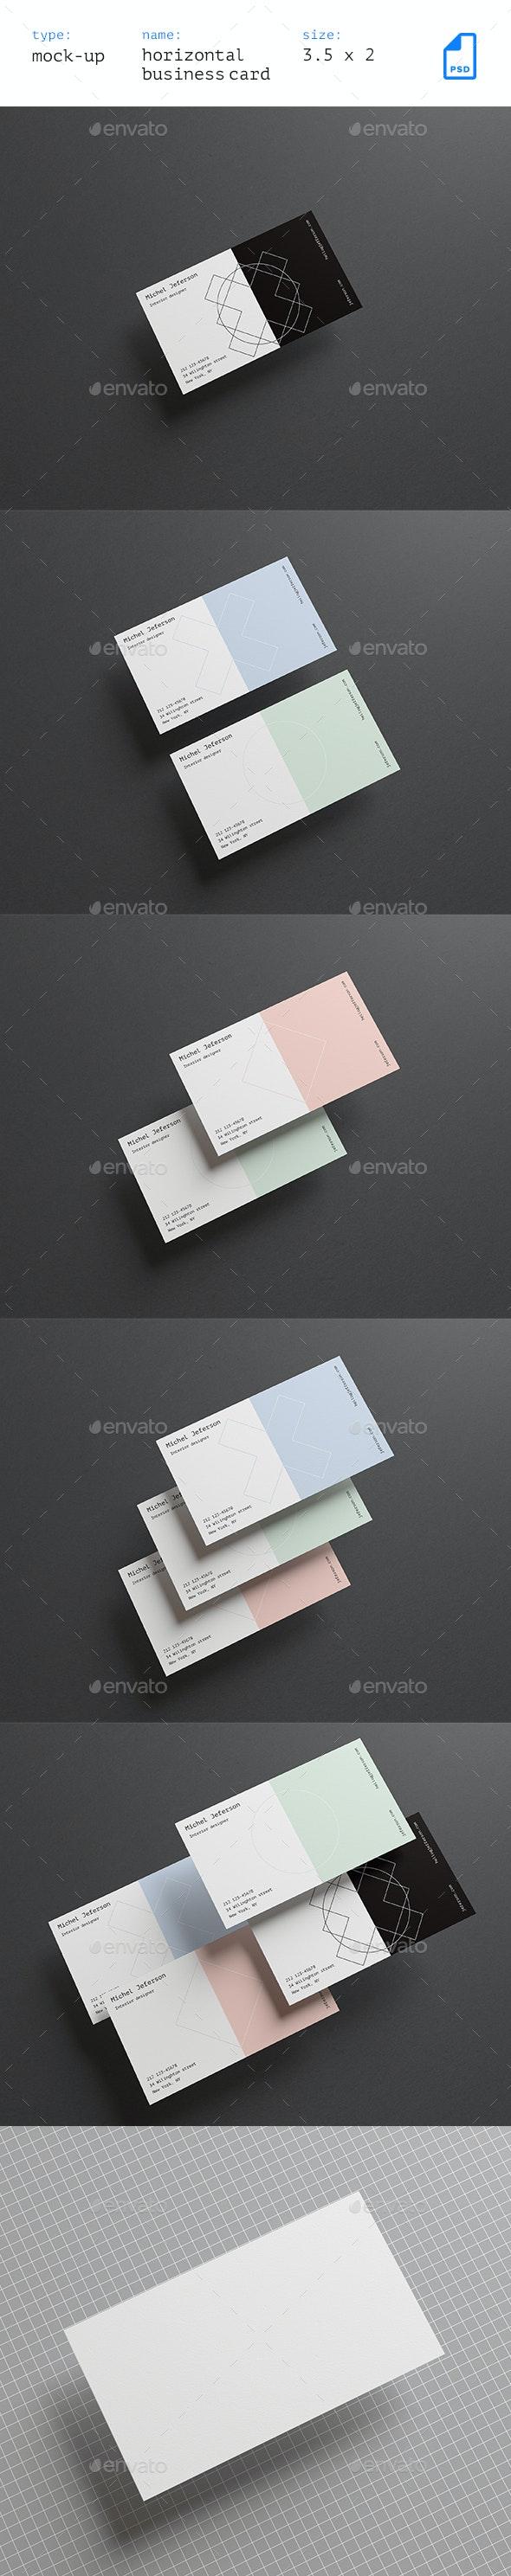 Horizontal Business Cards Mock-up Vol. 2 - Business Cards Print